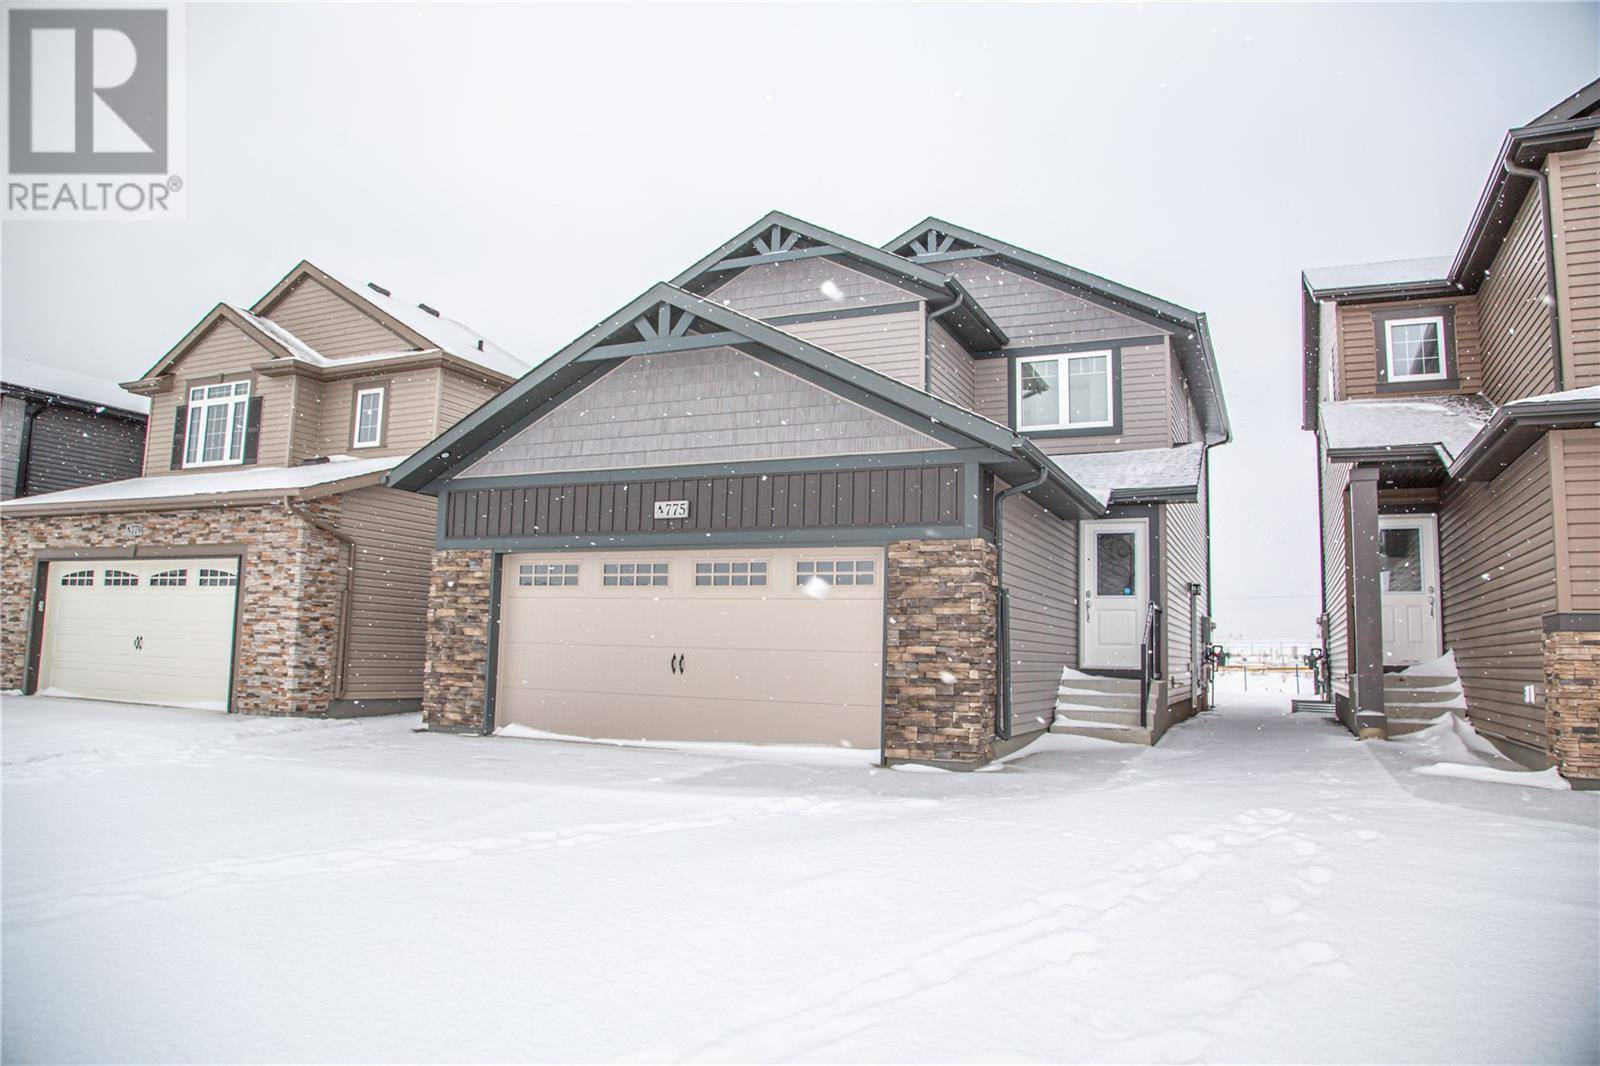 House for sale at 775 Mcfaull Ln Saskatoon Saskatchewan - MLS: SK792806